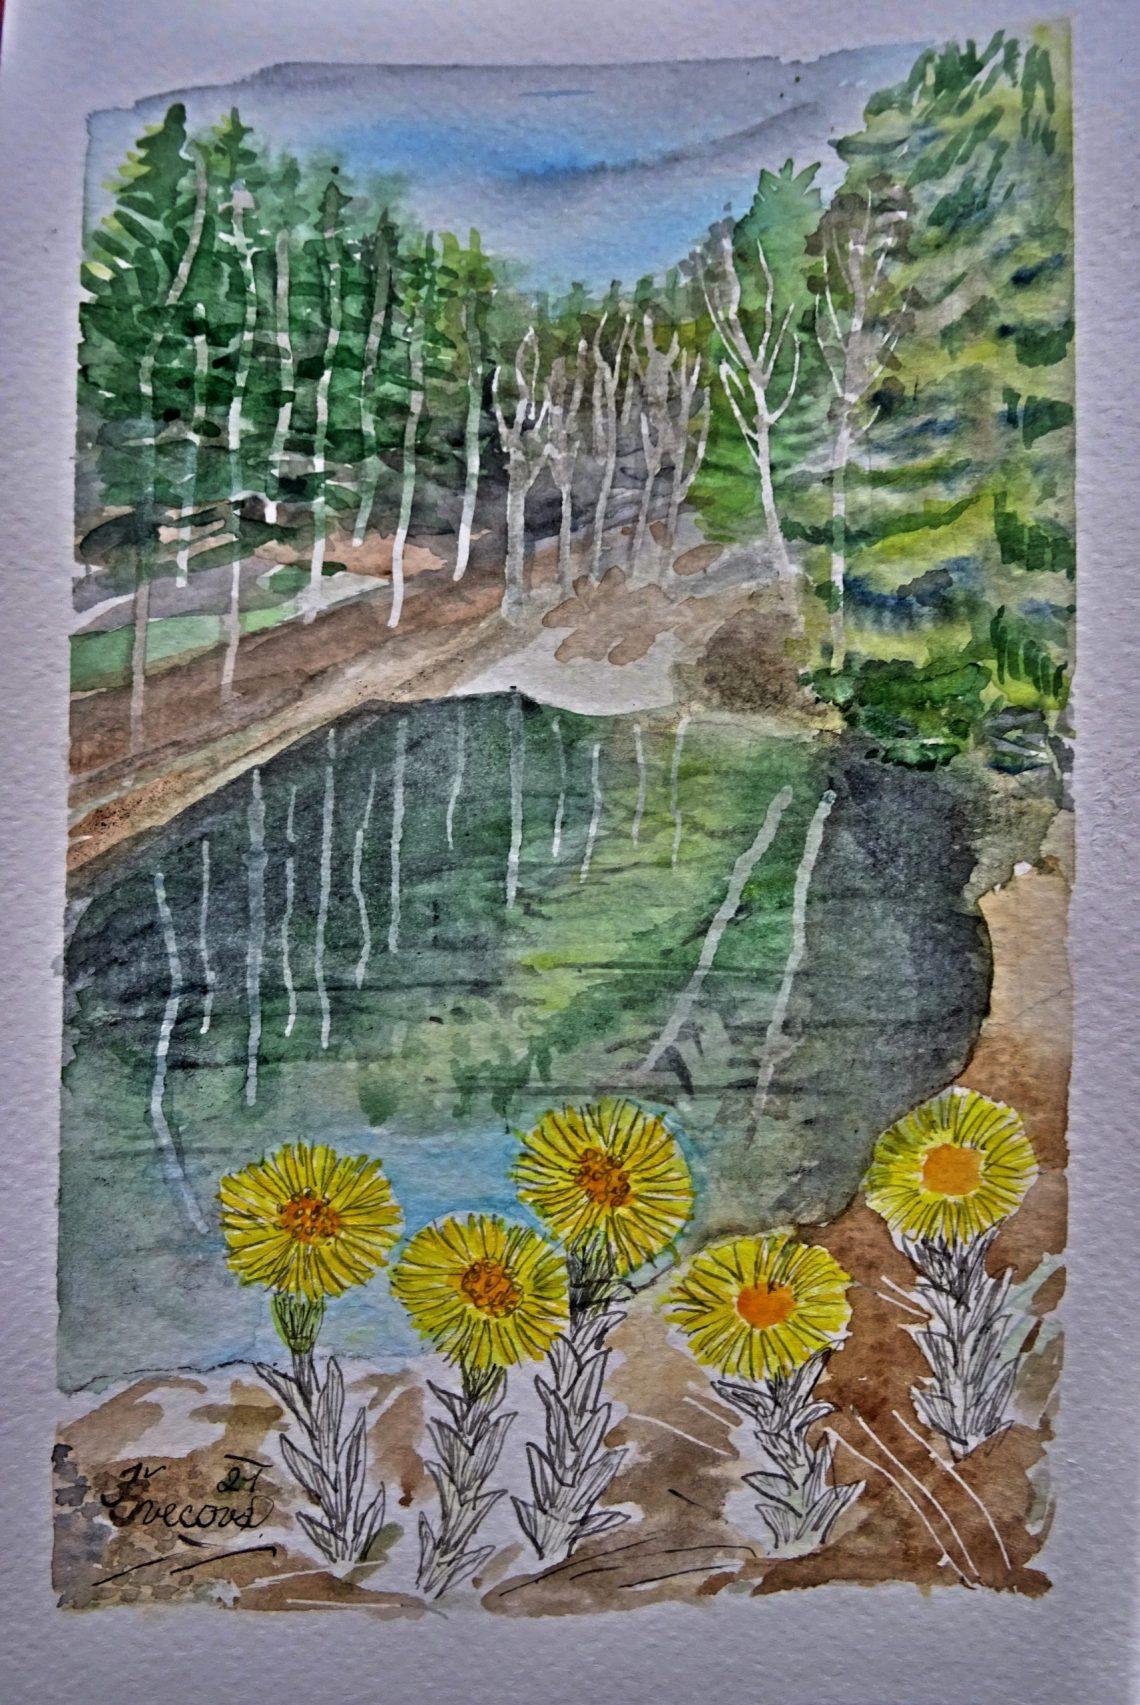 Na hrázi rybníka v lese kvete podběl